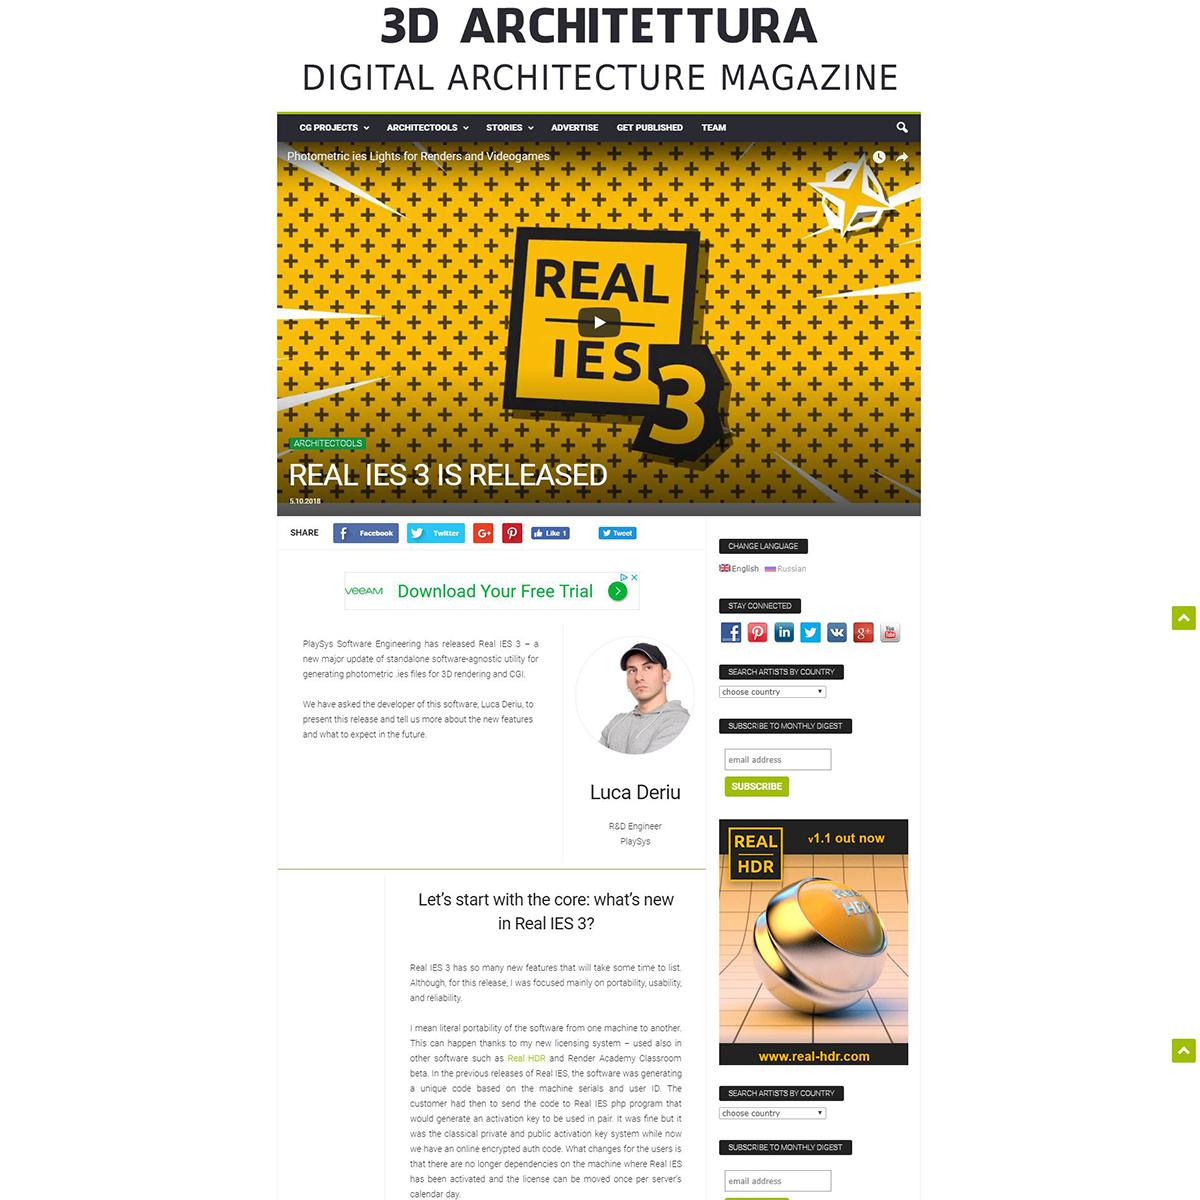 Real IES 3 - 3D Architettura